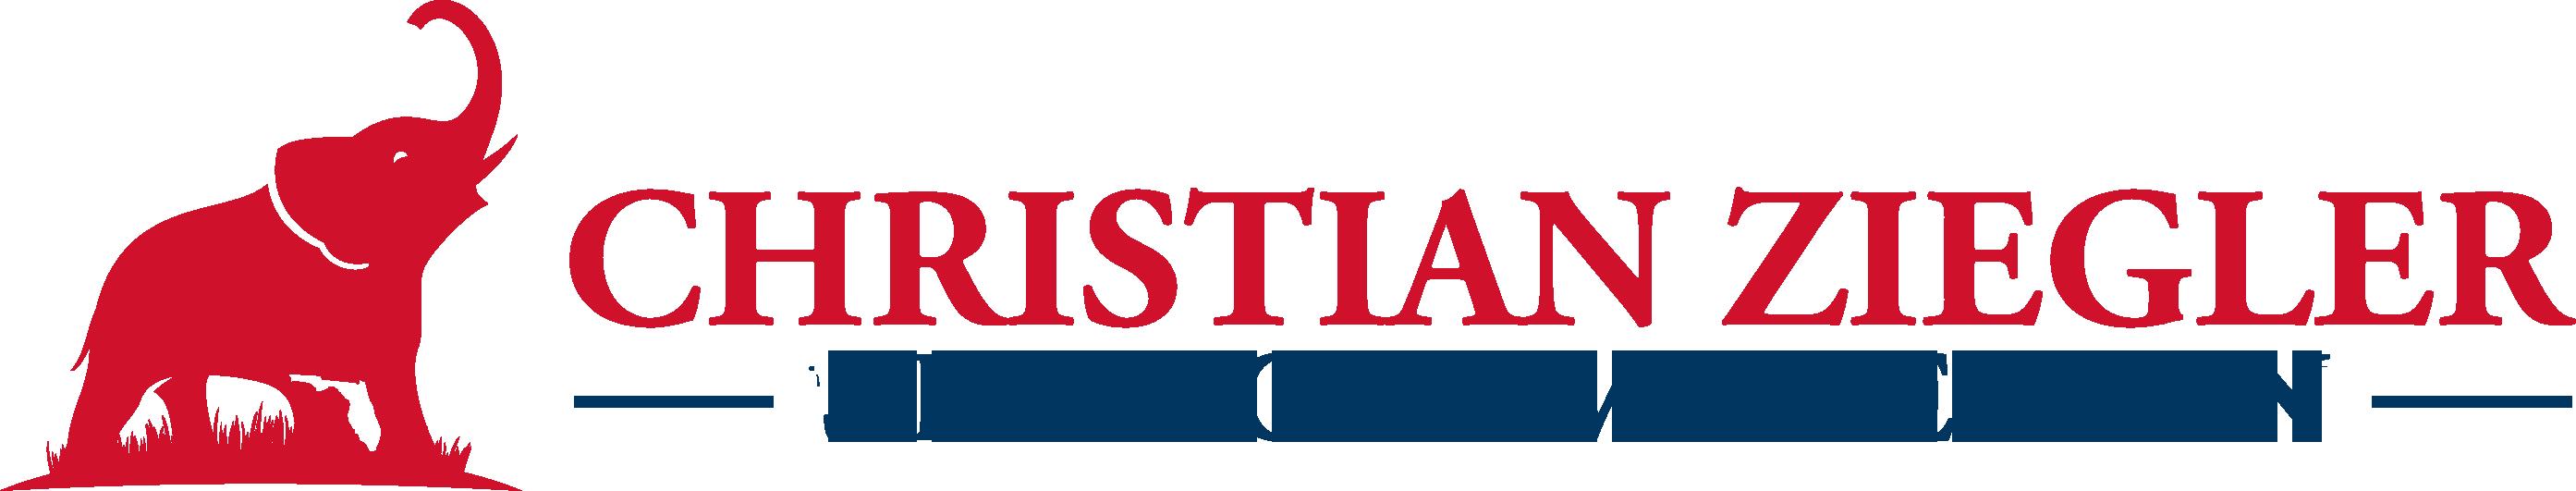 Christian Ziegler, State Committeeman